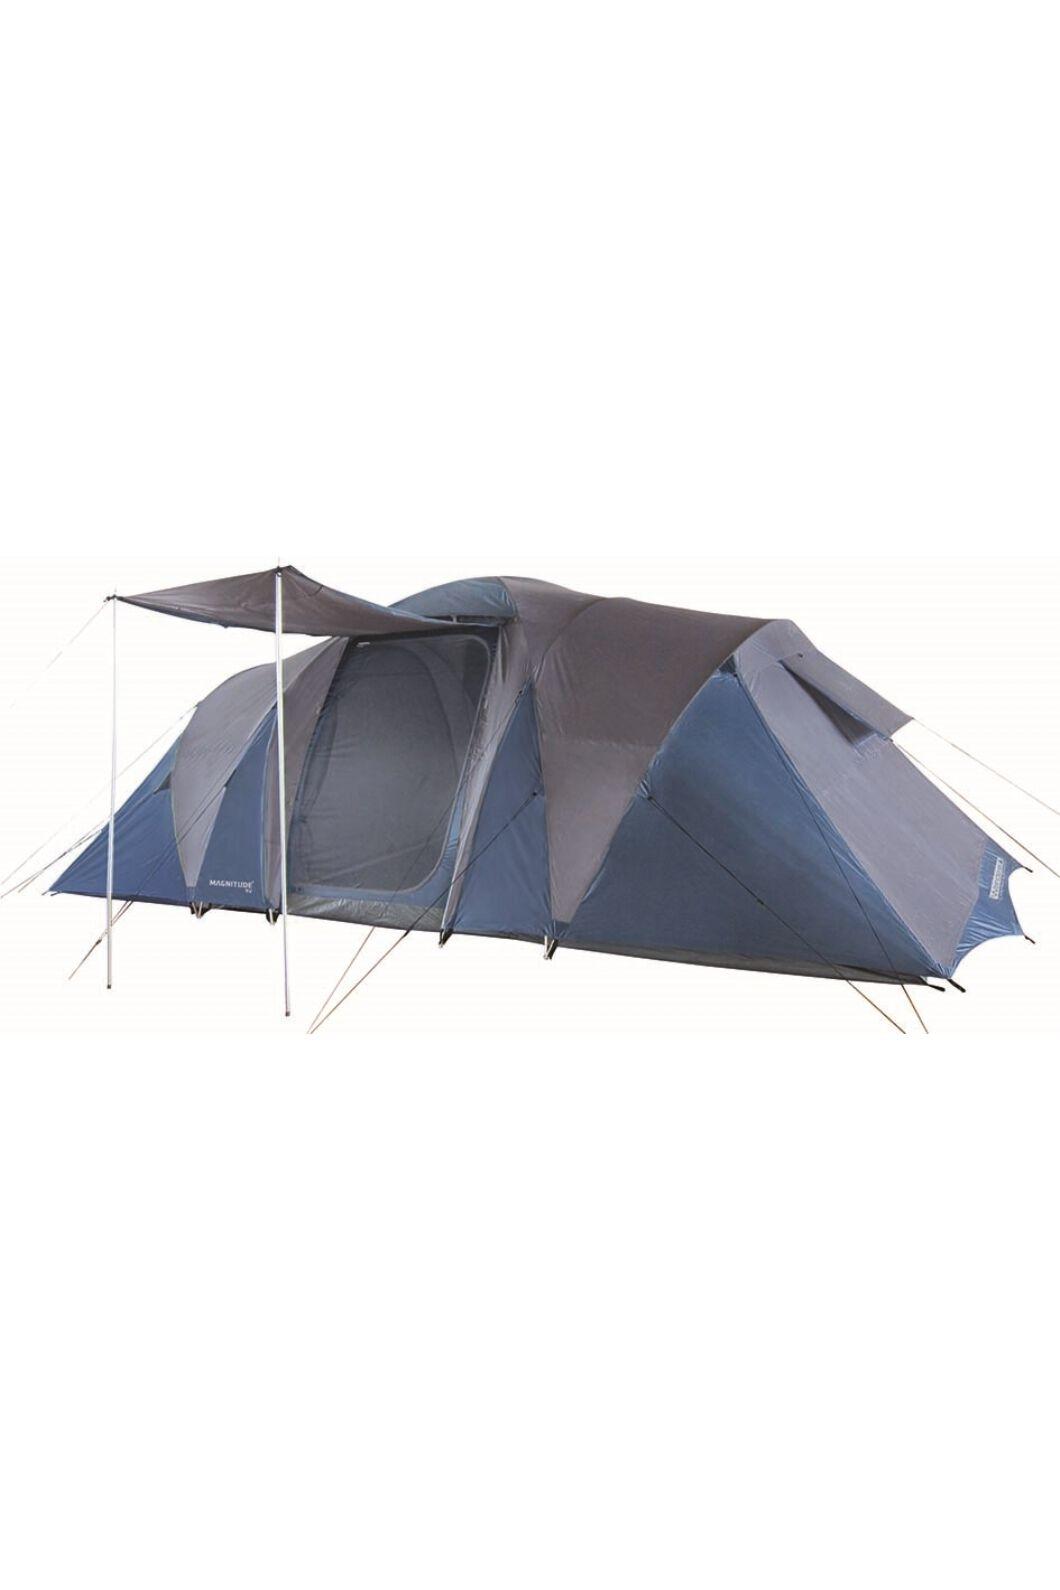 Wanderer Magnitude 9V 9 Person Dome Tent, None, hi-res